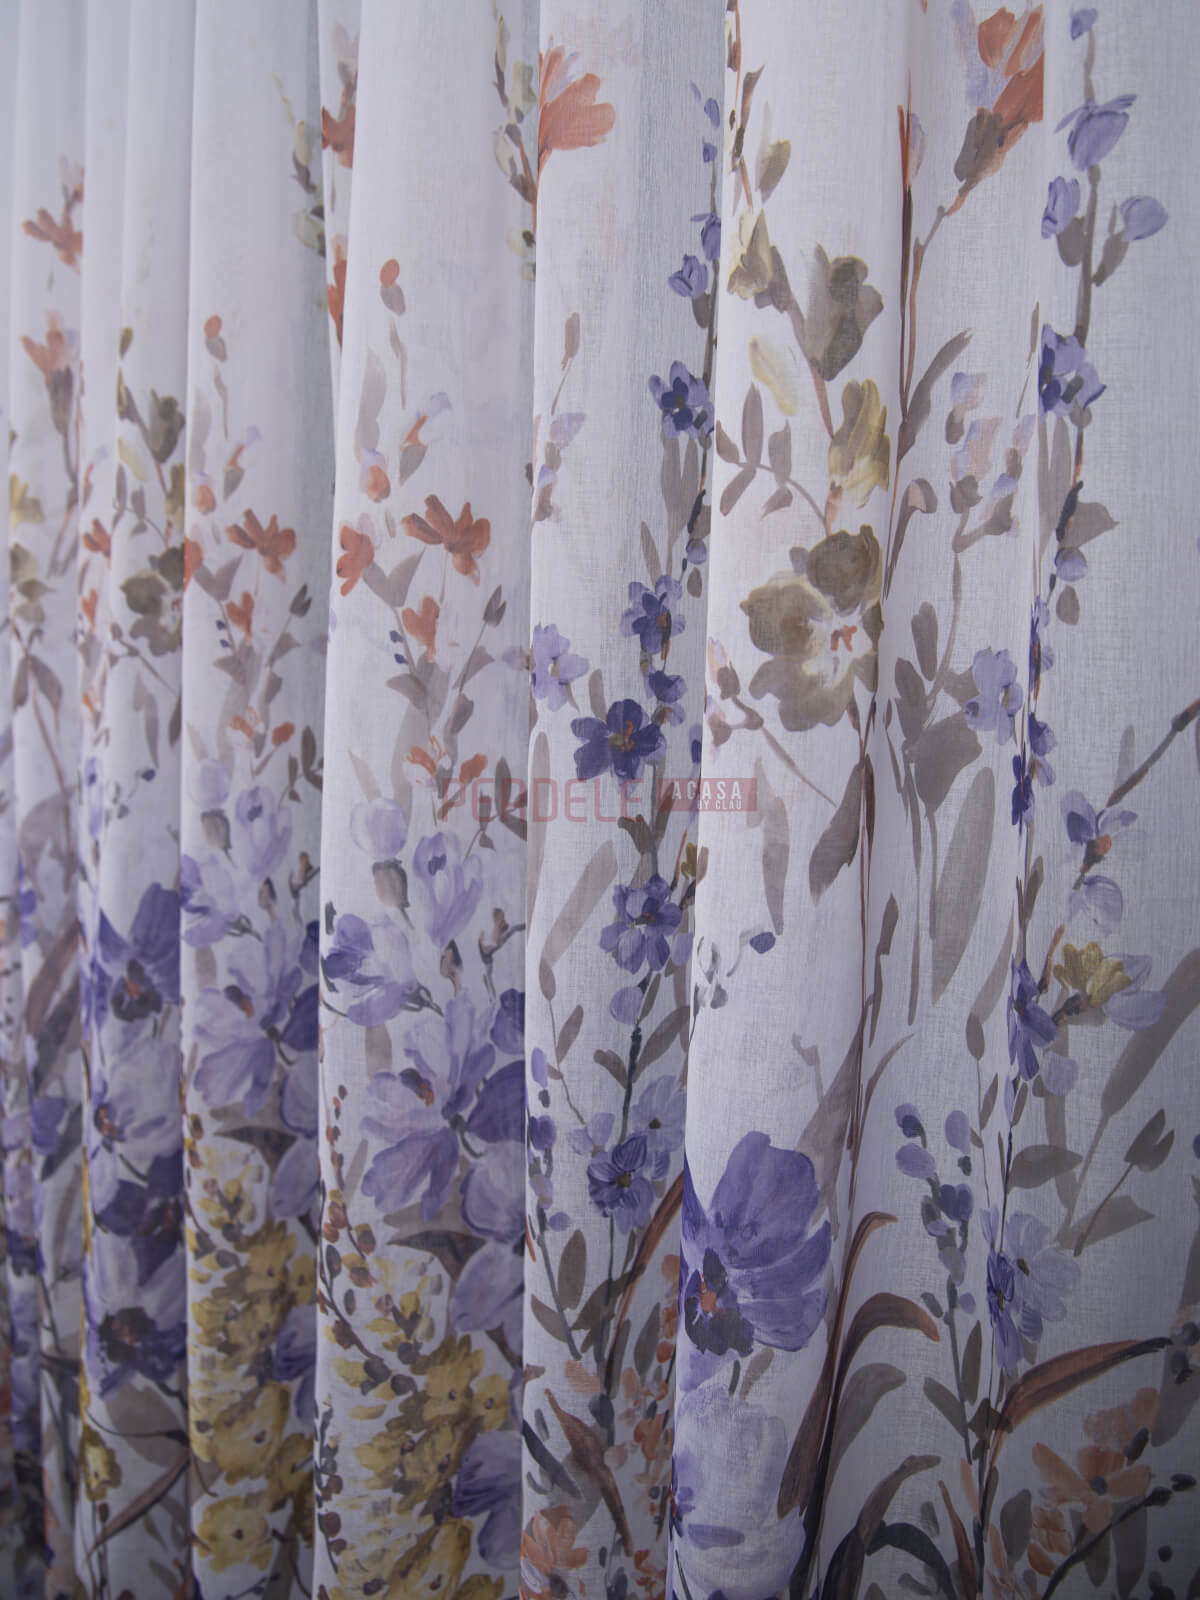 Perdea in bordura flori multicolore